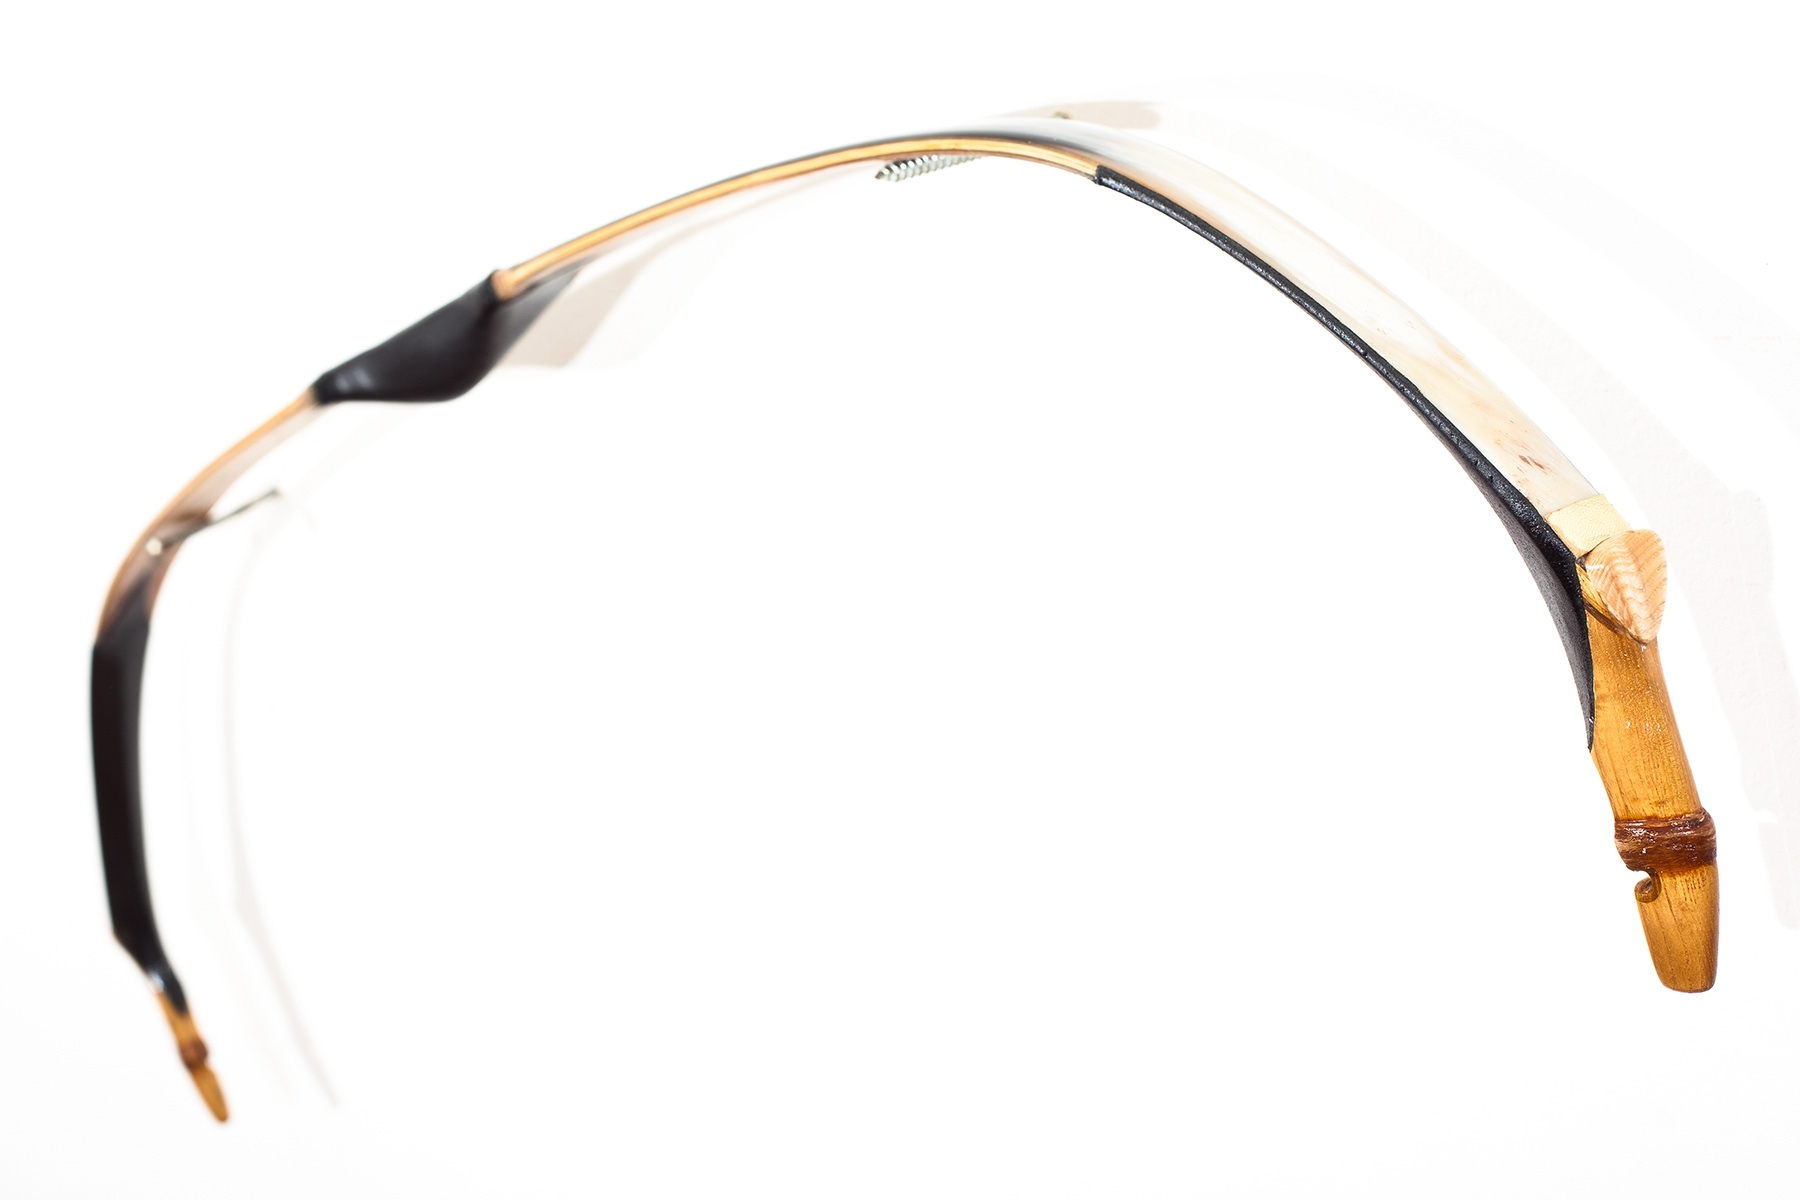 Turkish Biocomposite recurve bow